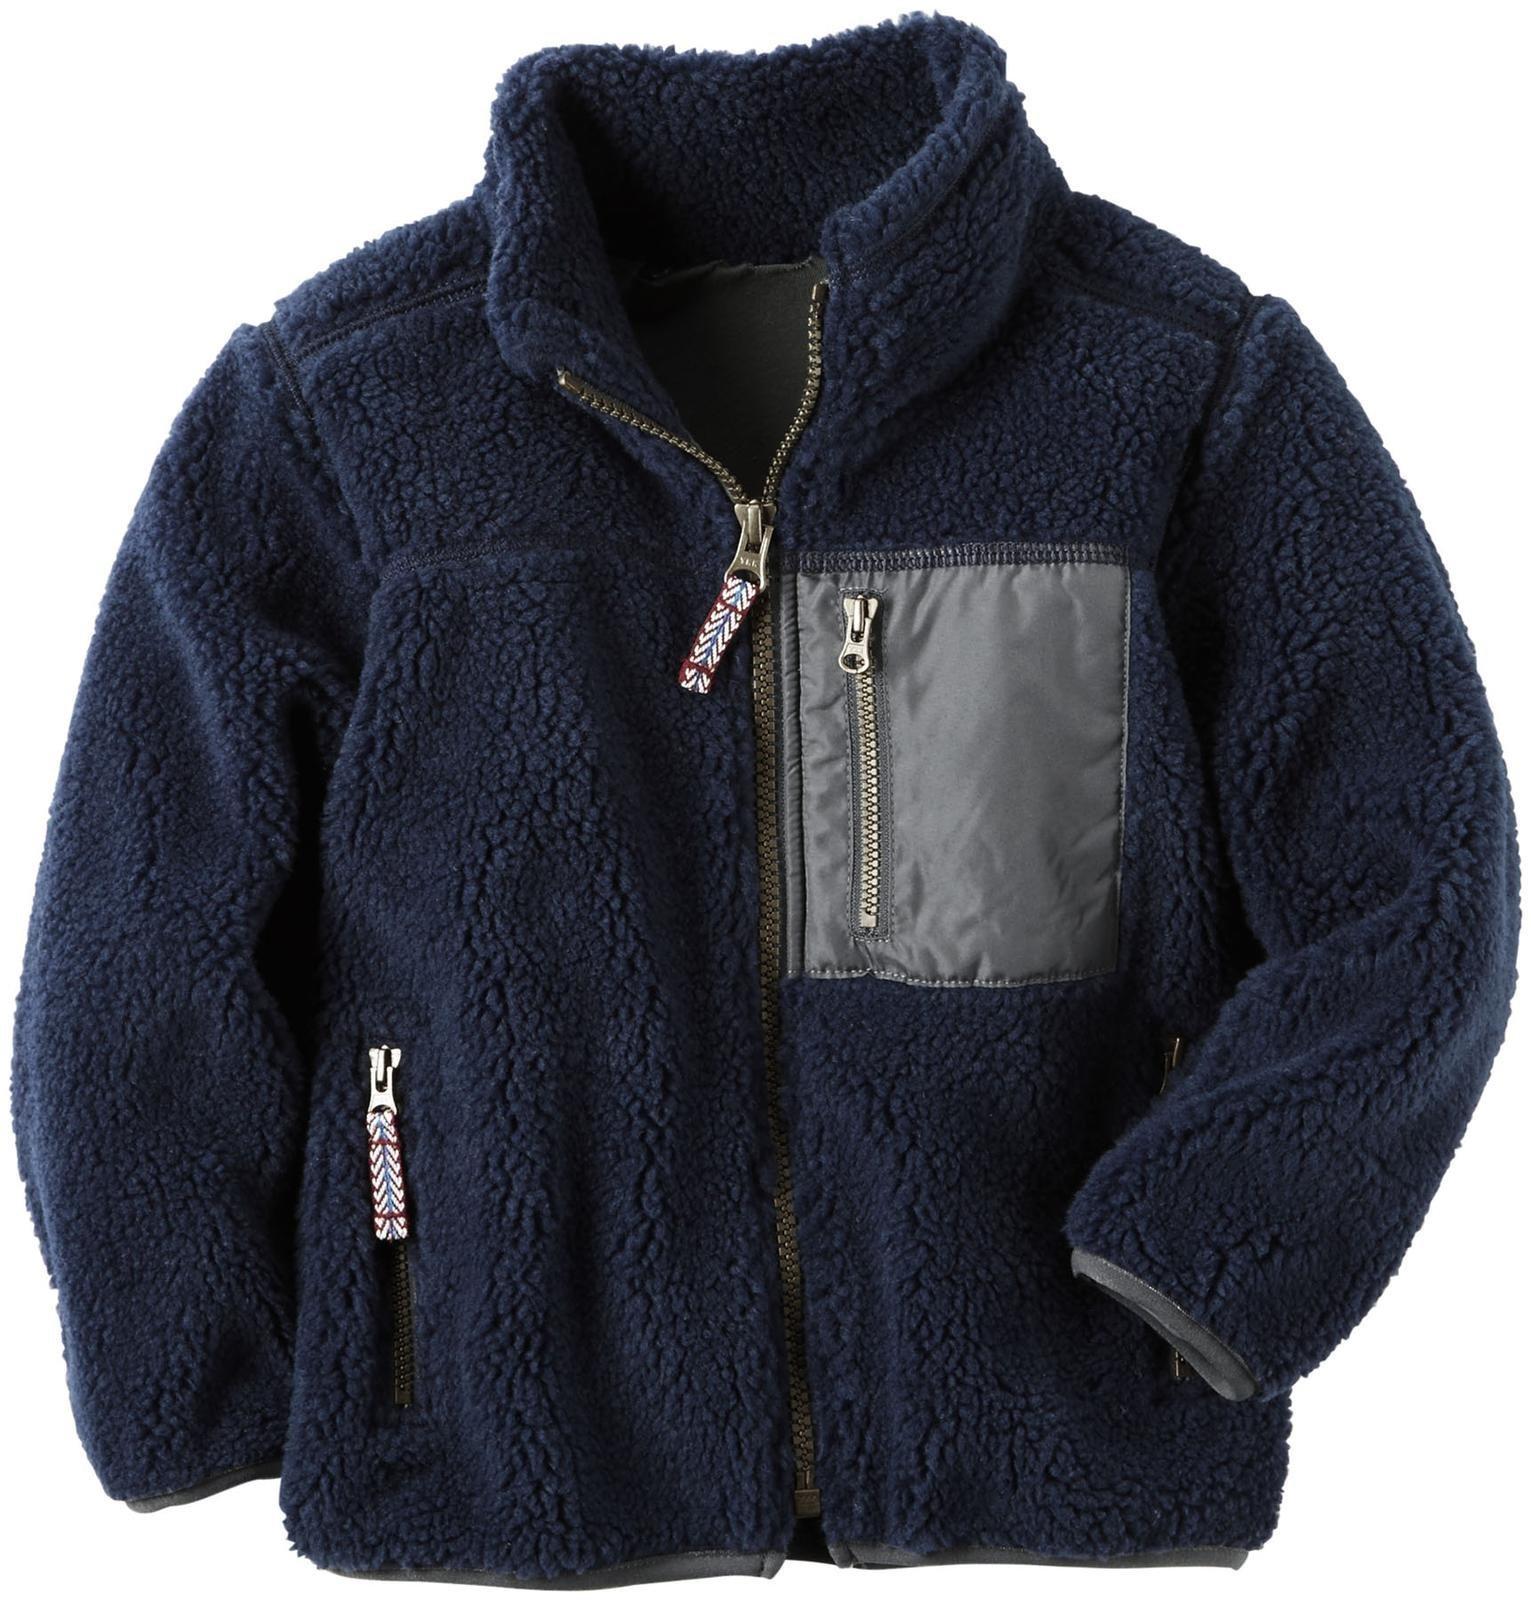 Carter's Boys' Knit Layering 263g576, Navy, 8